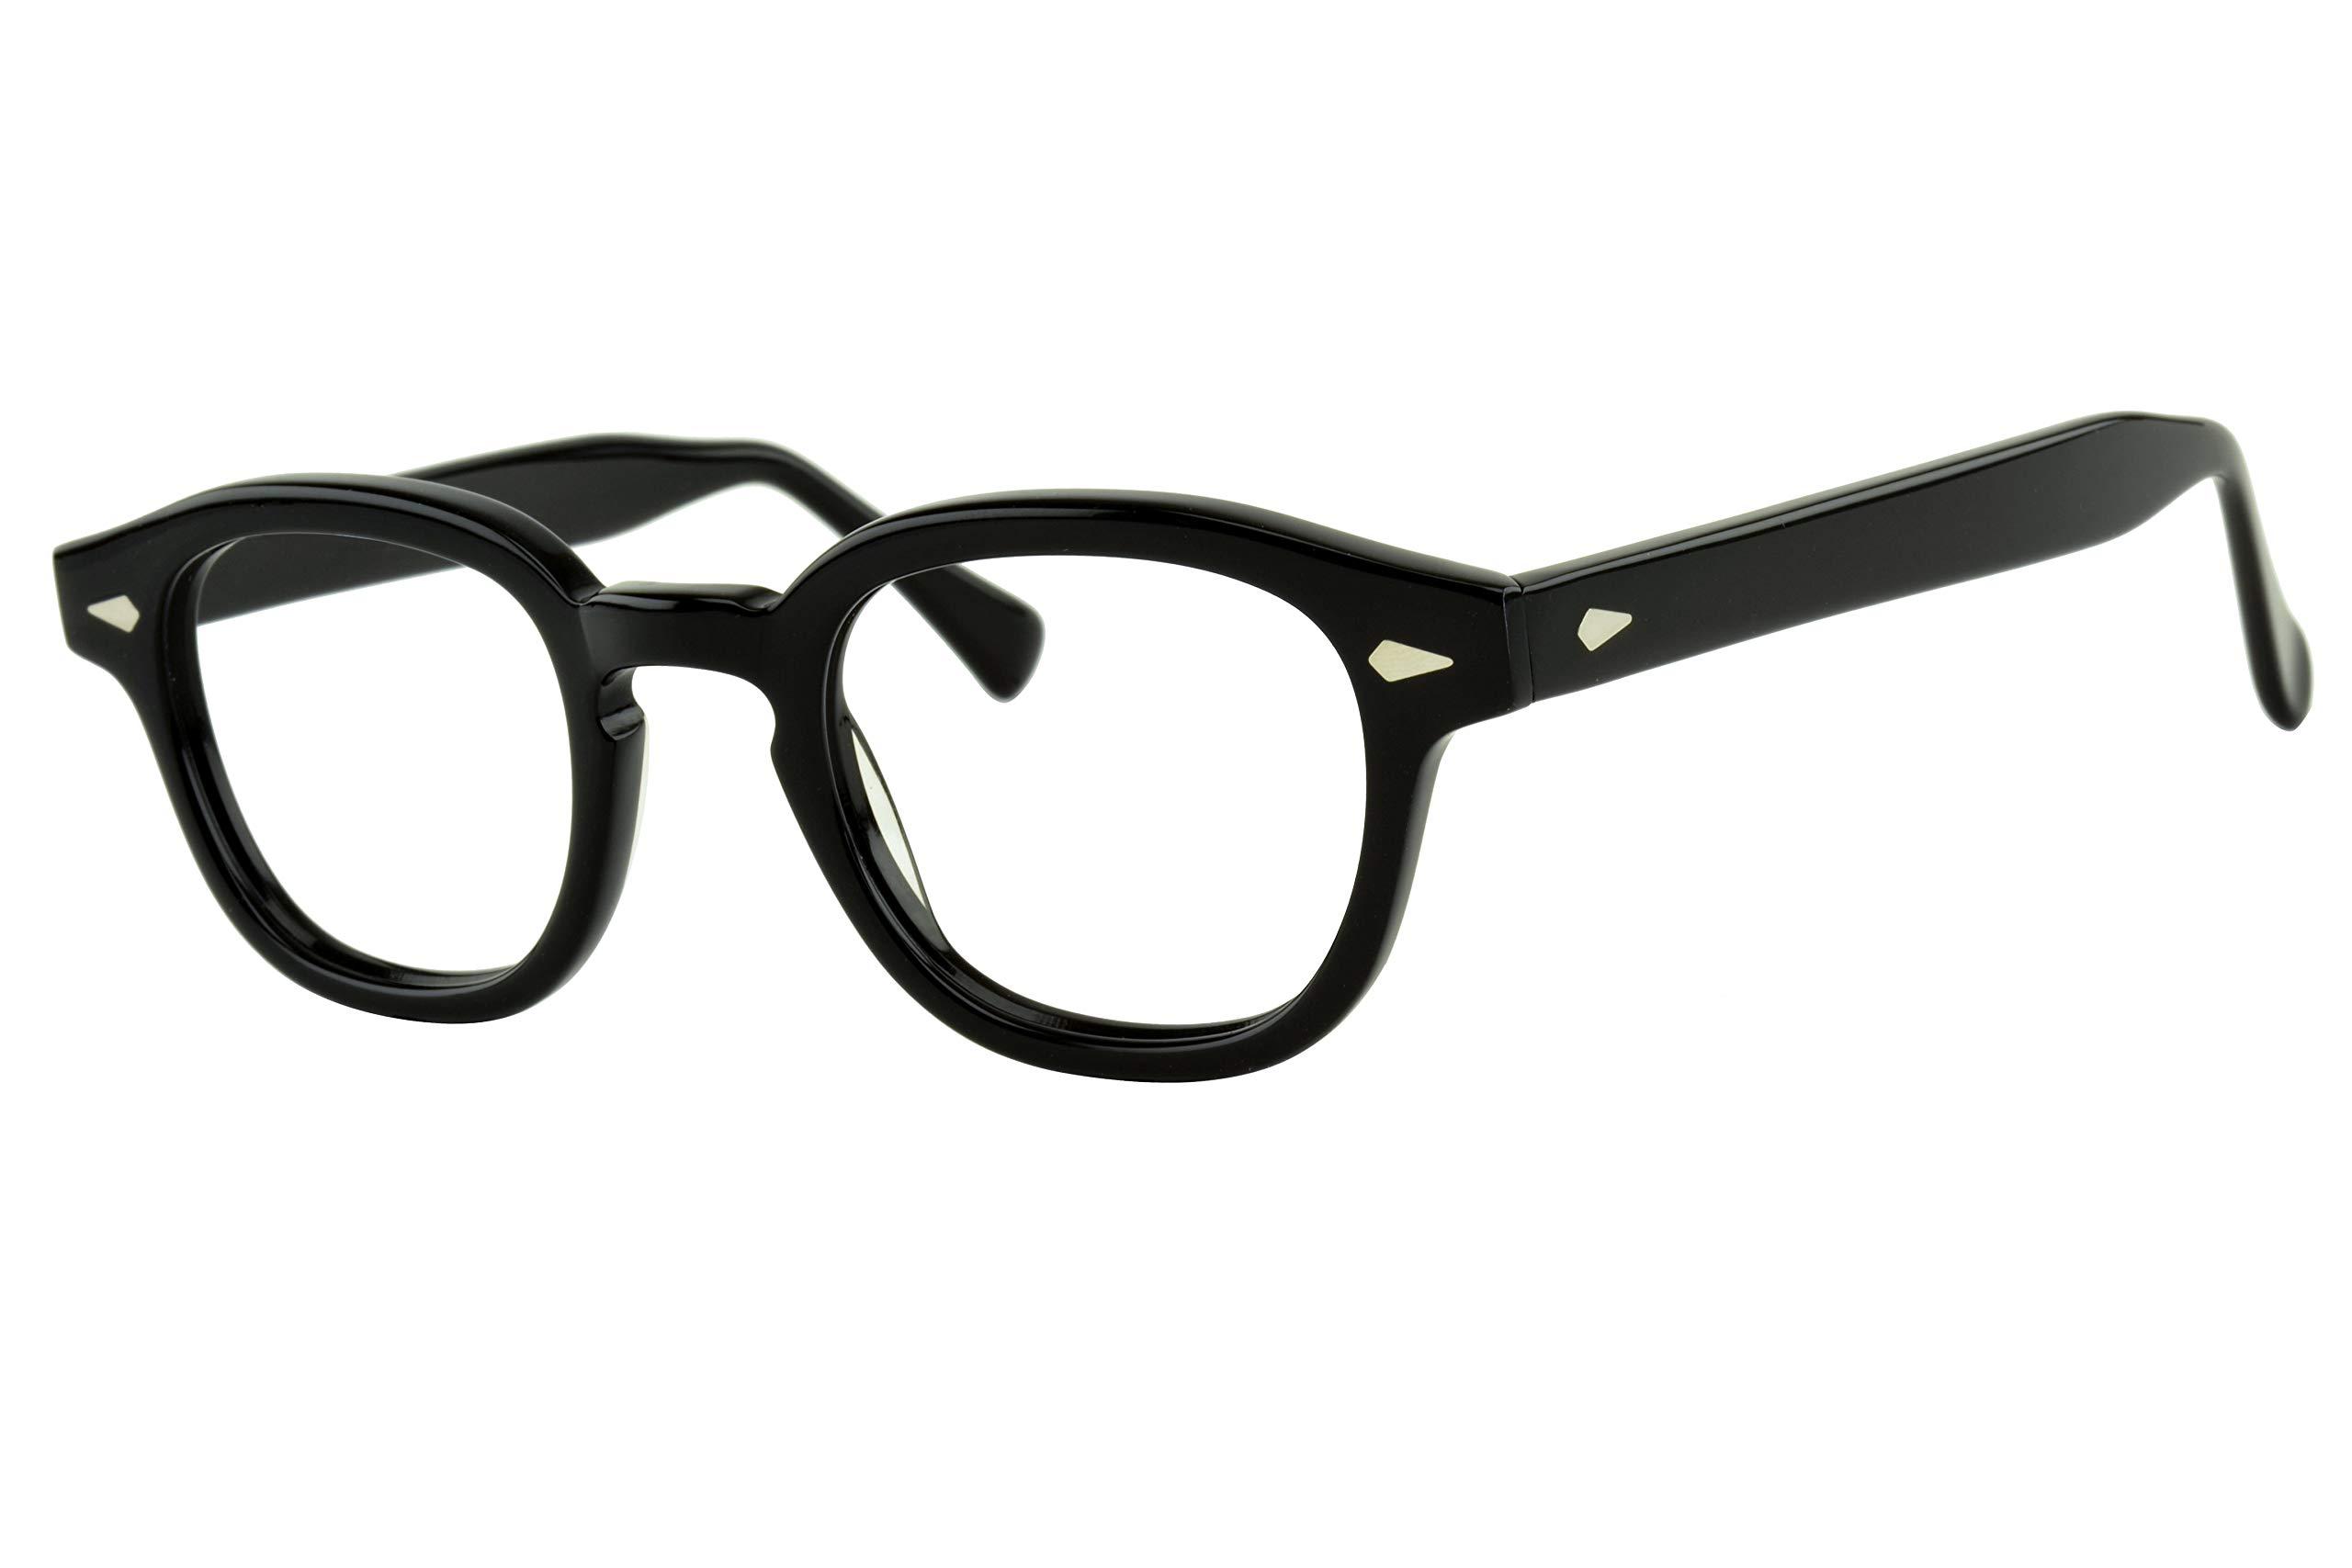 Verona Love Hand Made Acetate Computer Reading Eyeglasses Blue Light Blocking Premium Gamer Anti Eyestrain Eyewear for Men and Women (Classic Black Size VLV46)